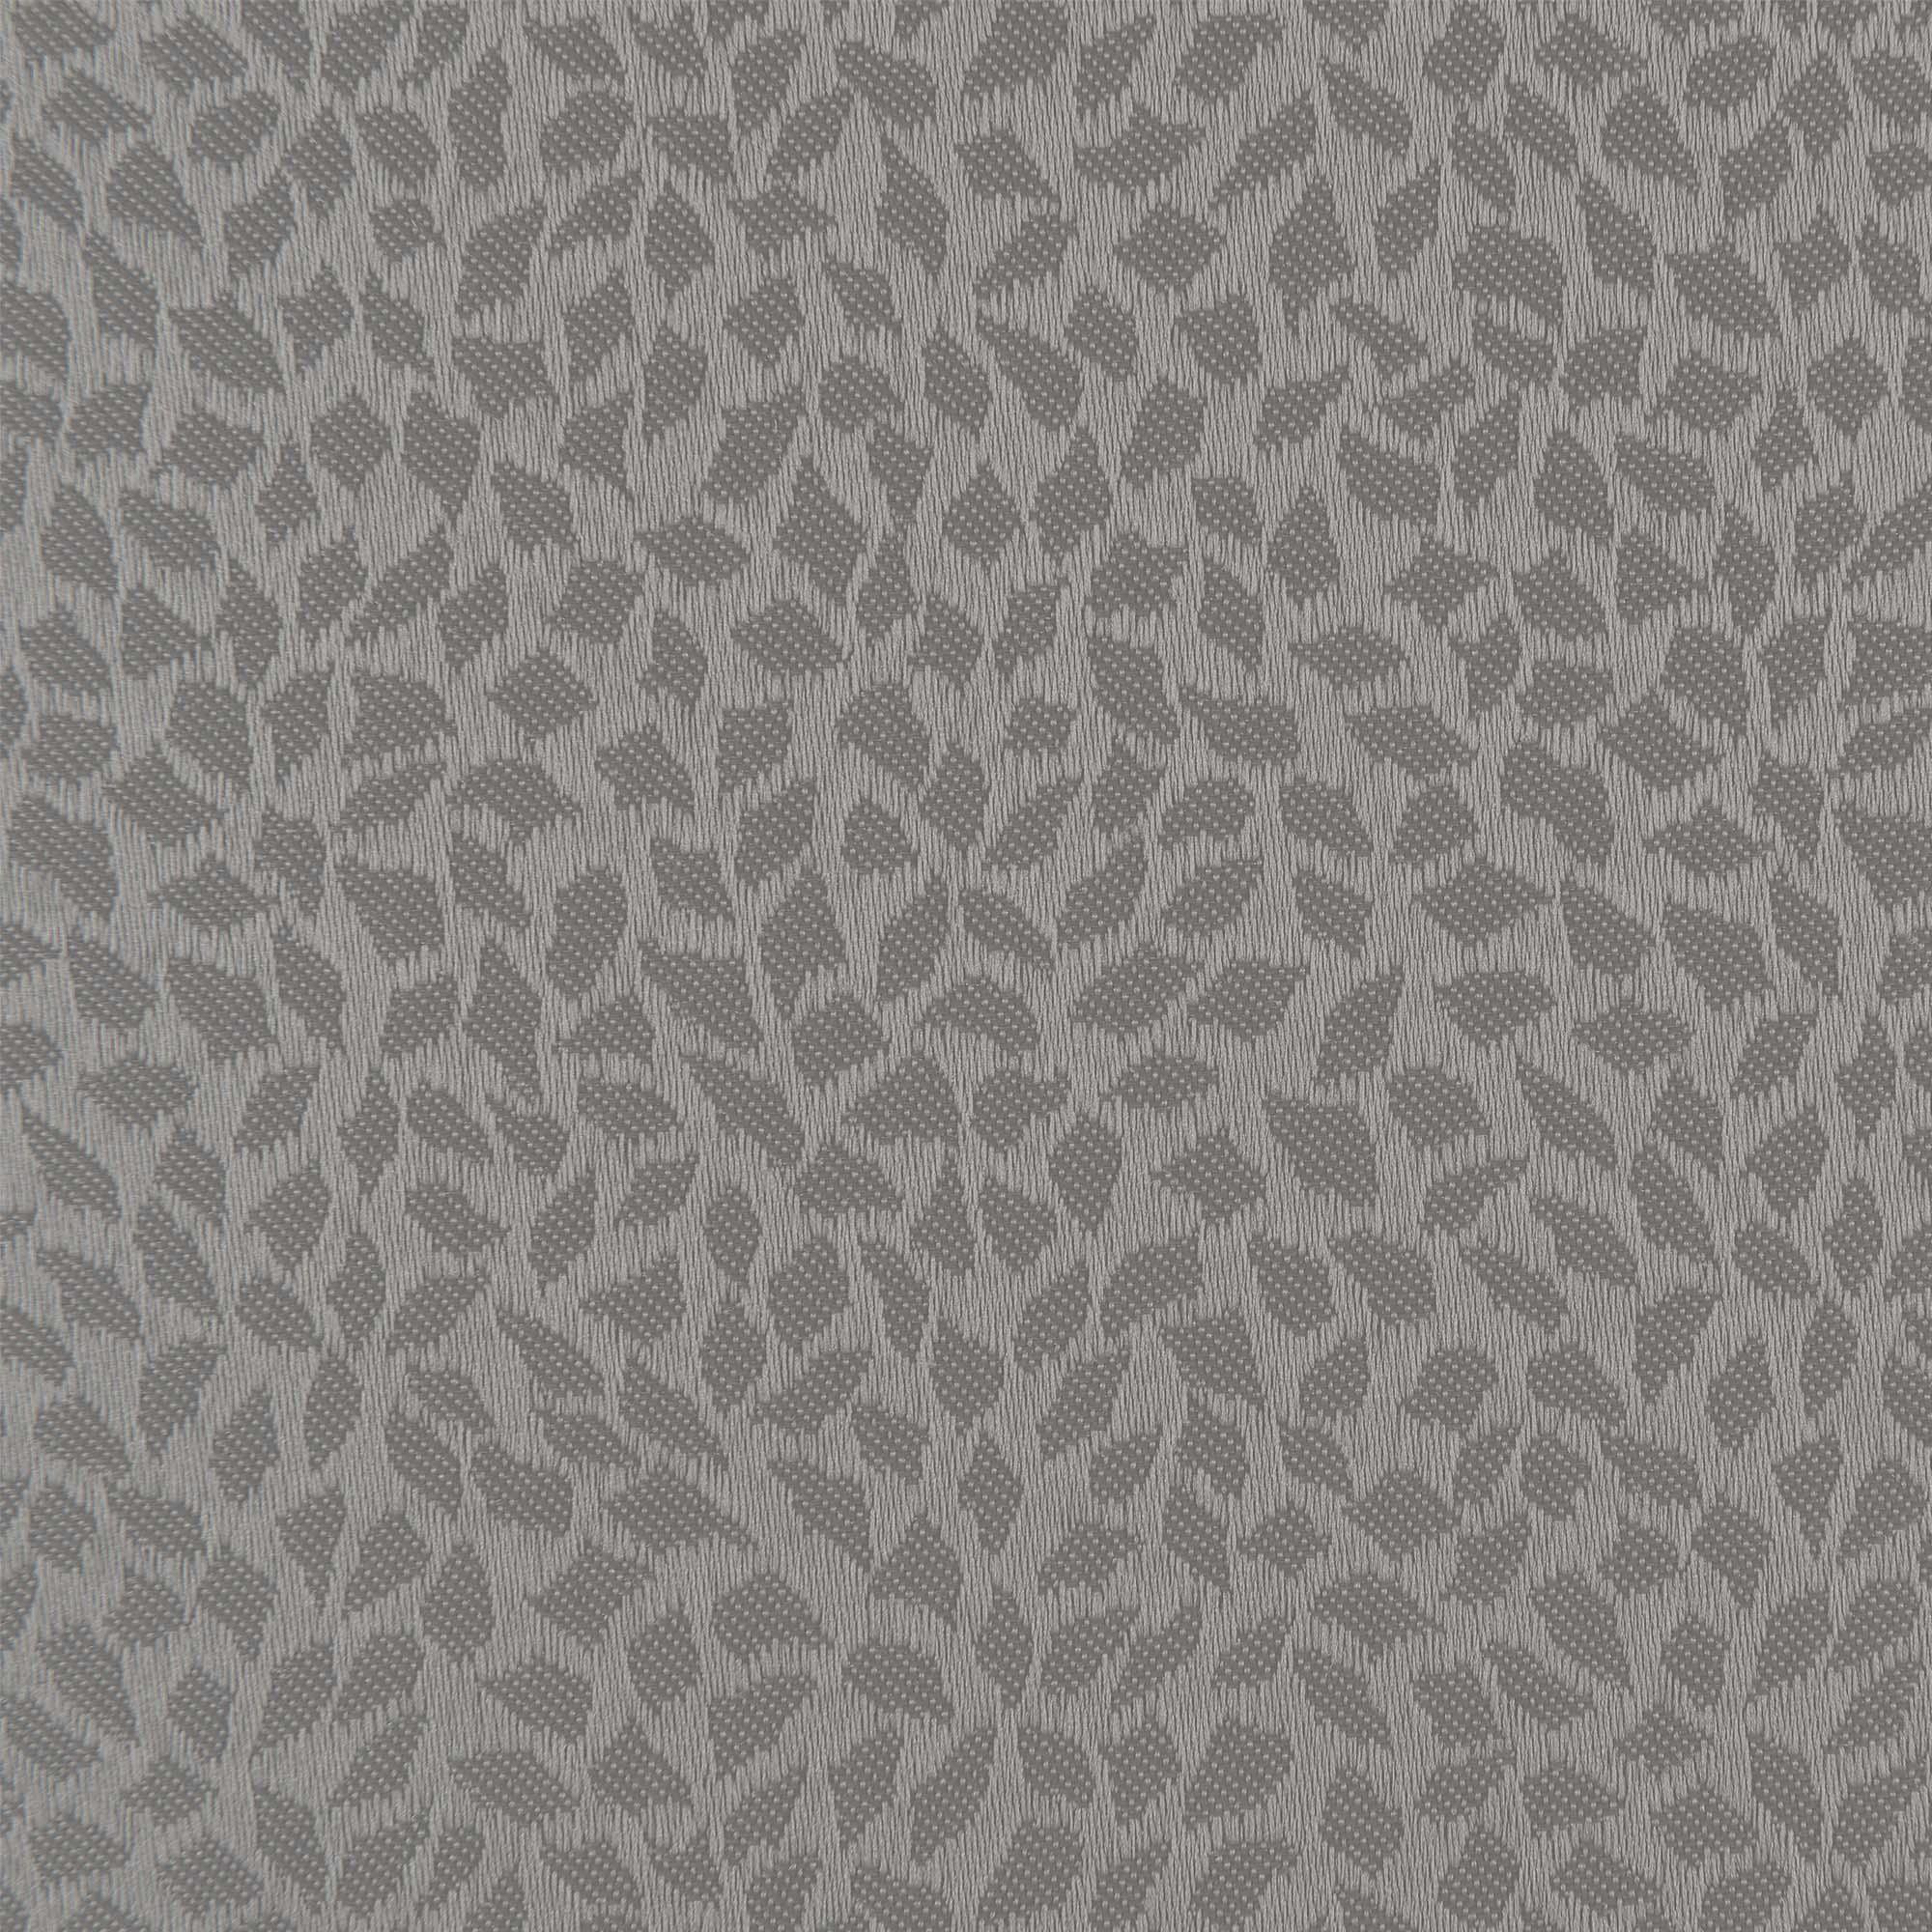 Alessi Pebble Blind Fabric